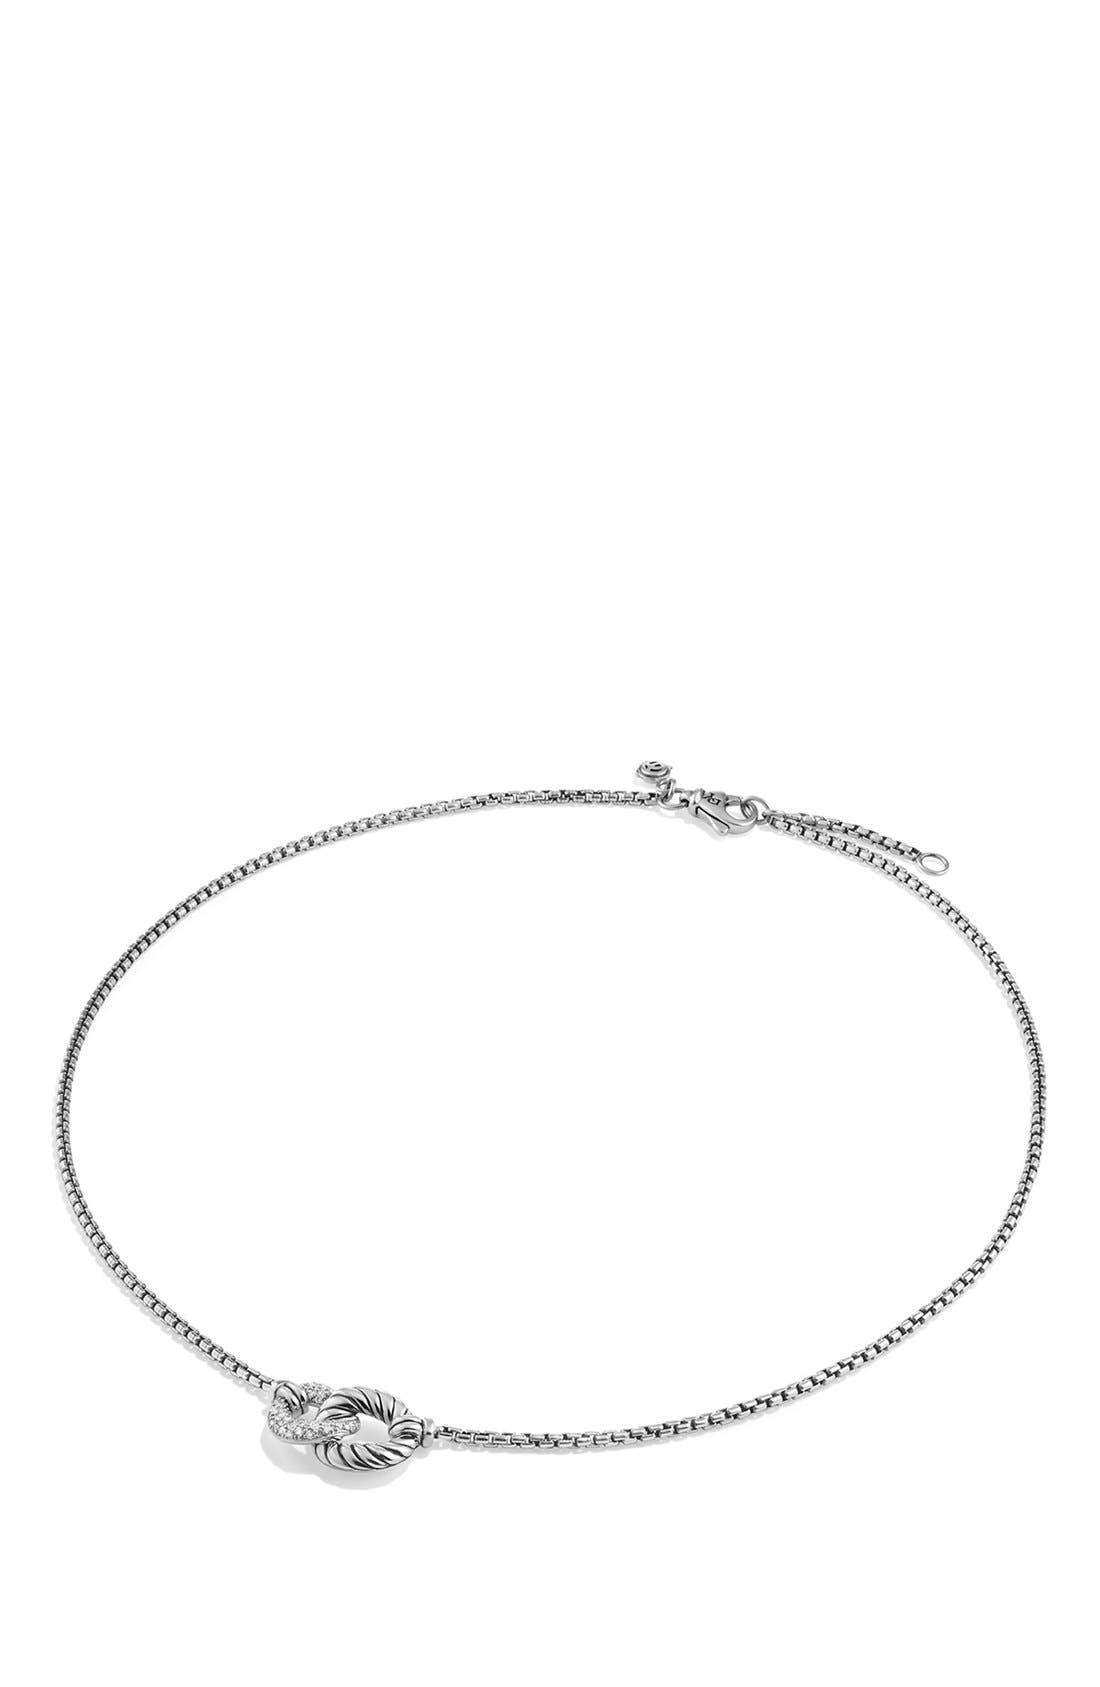 'Belmont' Necklace with Diamonds,                             Alternate thumbnail 4, color,                             DIAMOND